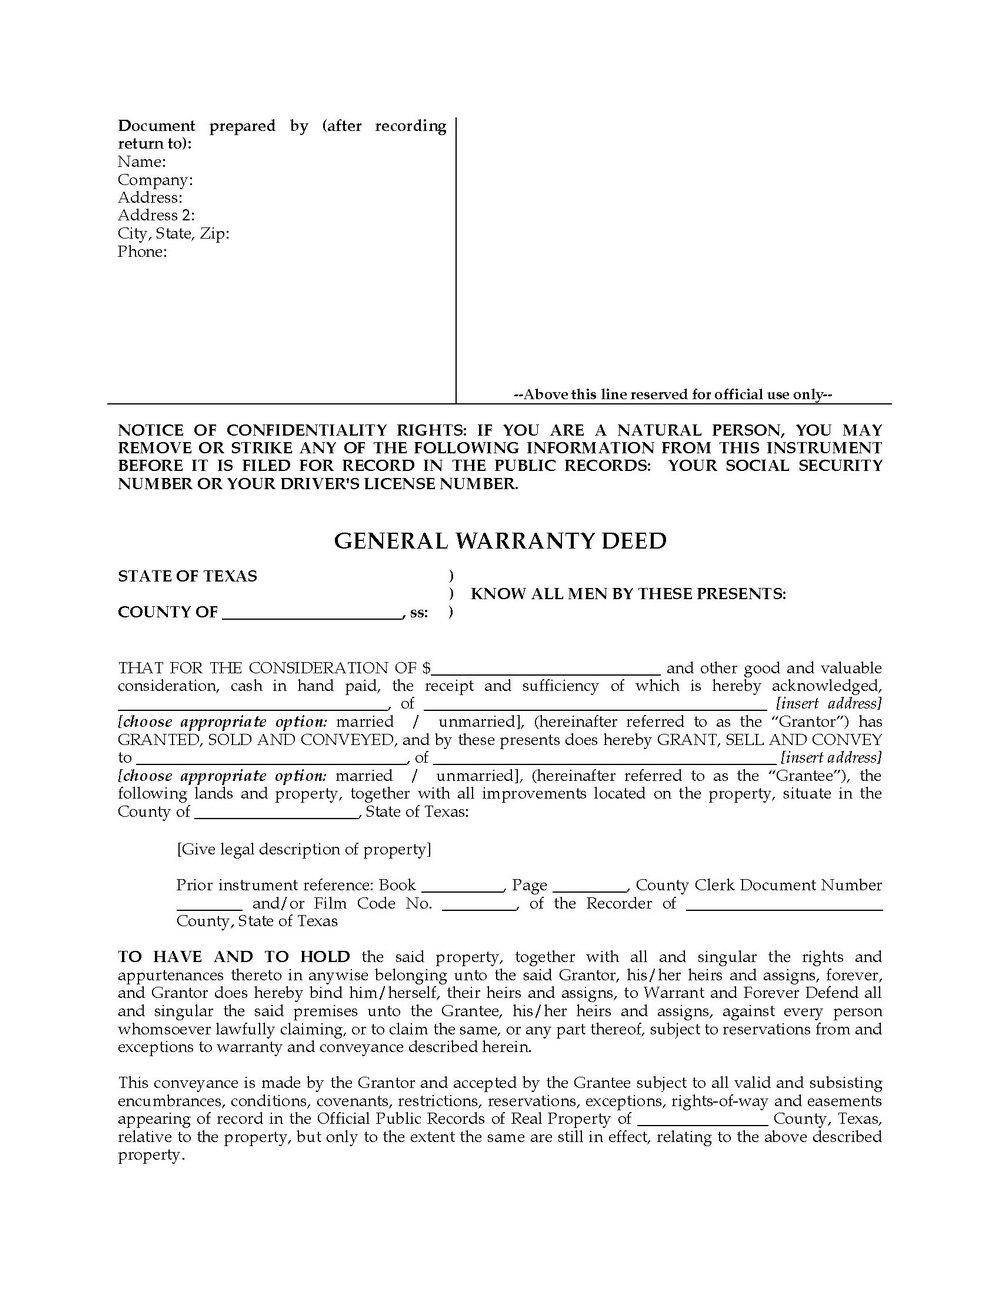 Warranty Deed Form Pdf